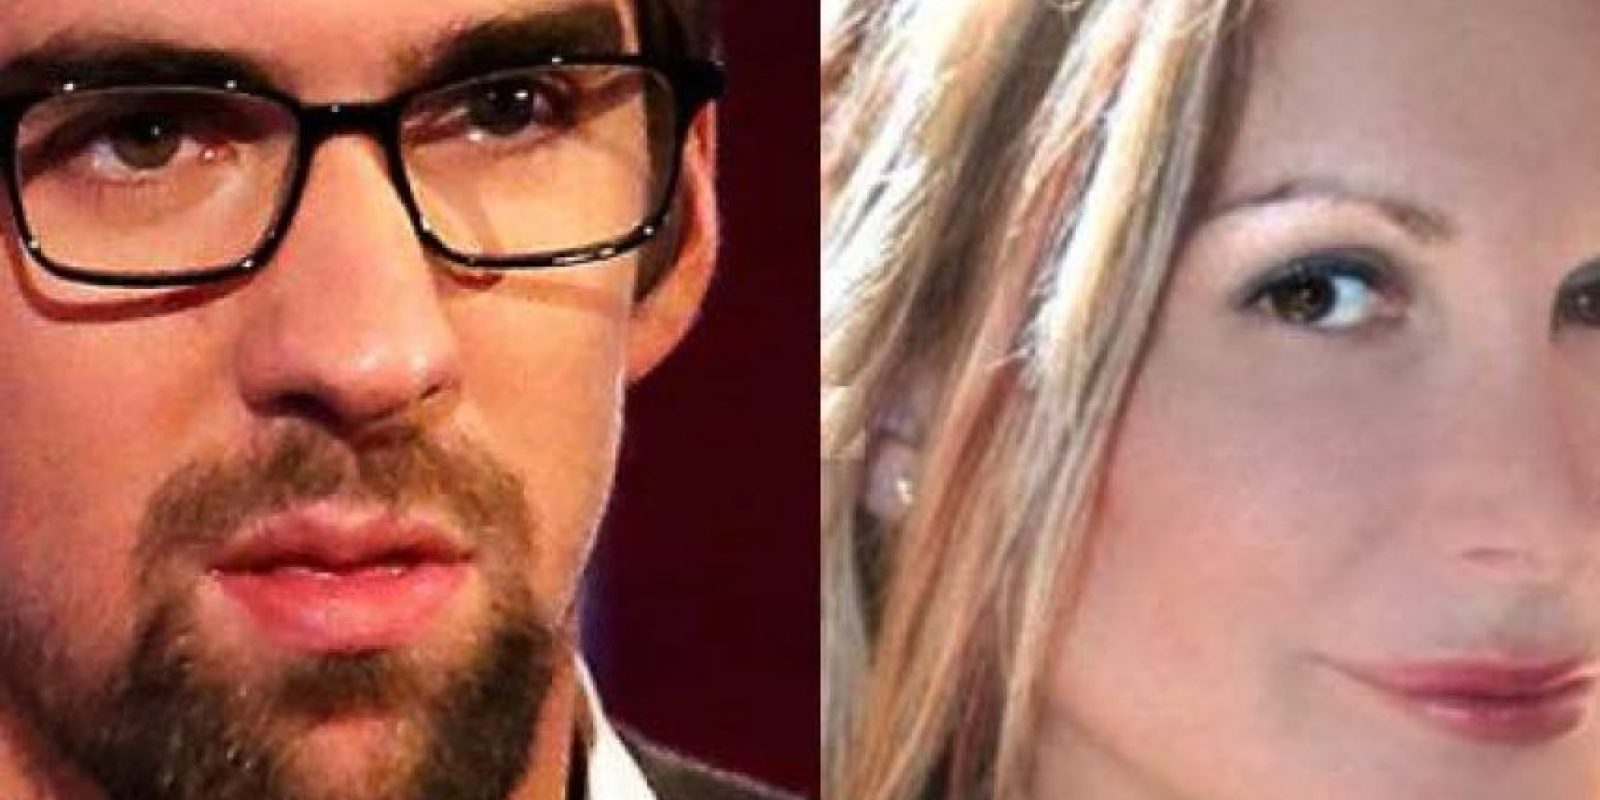 Taylor Lianne Chandler aseguró que nació como hombre Foto:Facebook: Taylor Lianne Chandler